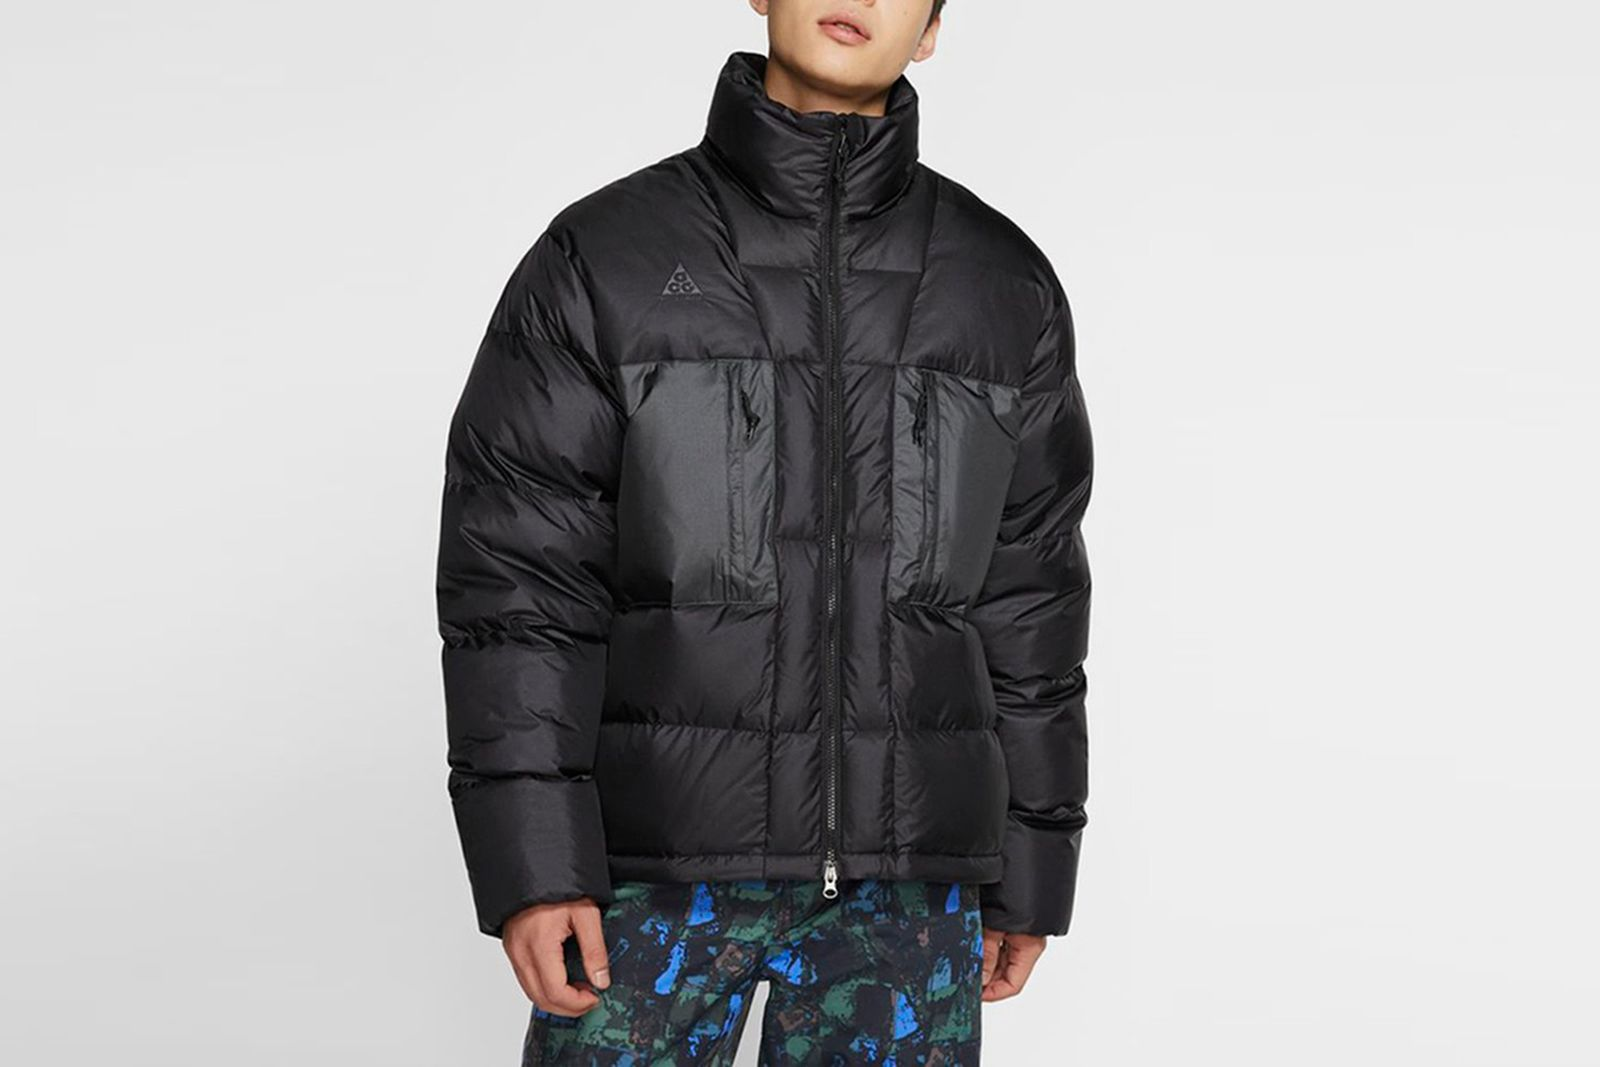 nike-outerwear-winter-main